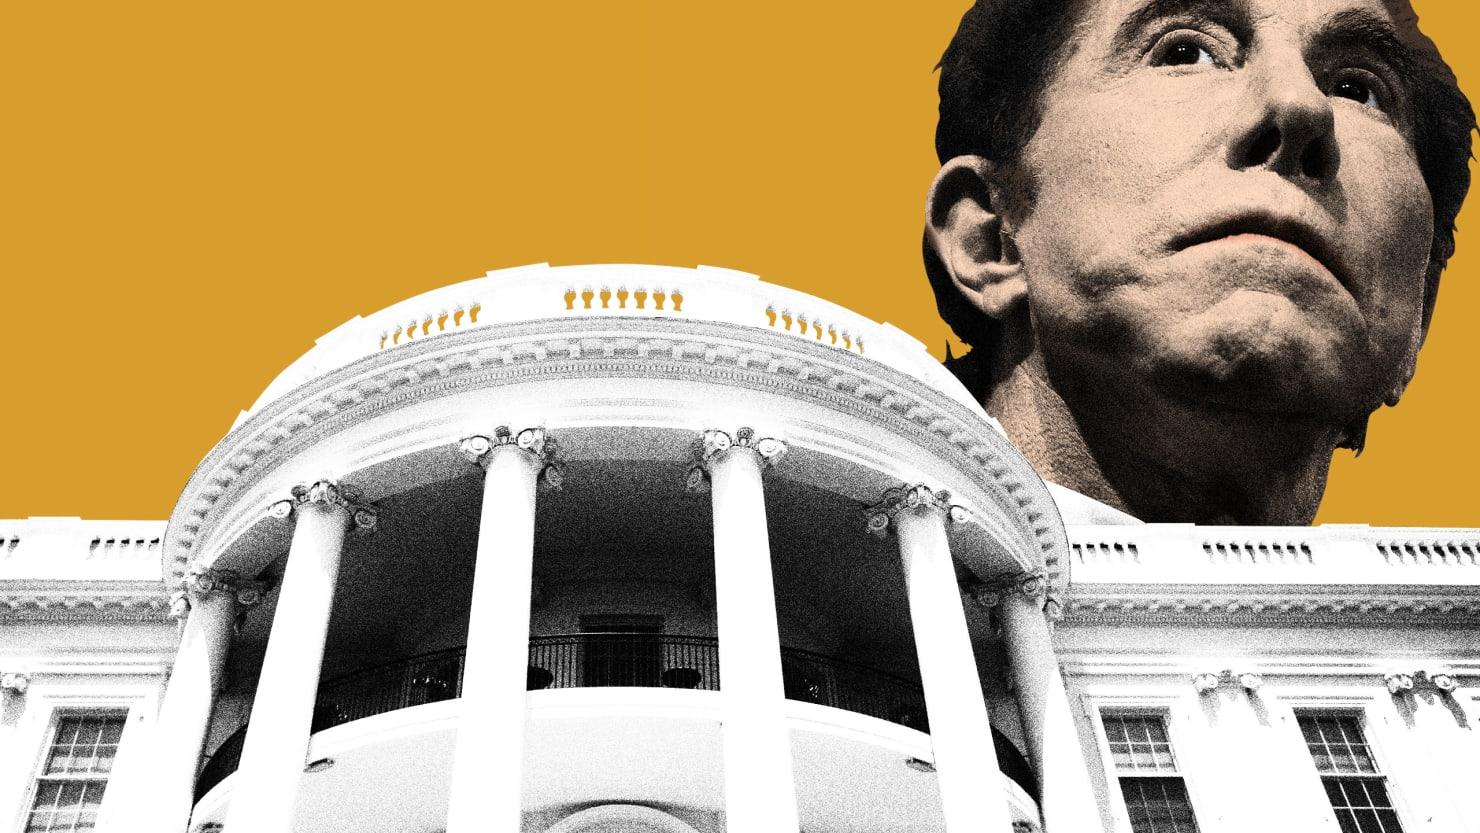 White House bends rules about tipping for Steve Wynn 190110-stein-markay-steve-wynn-trump-hero_qzkvln